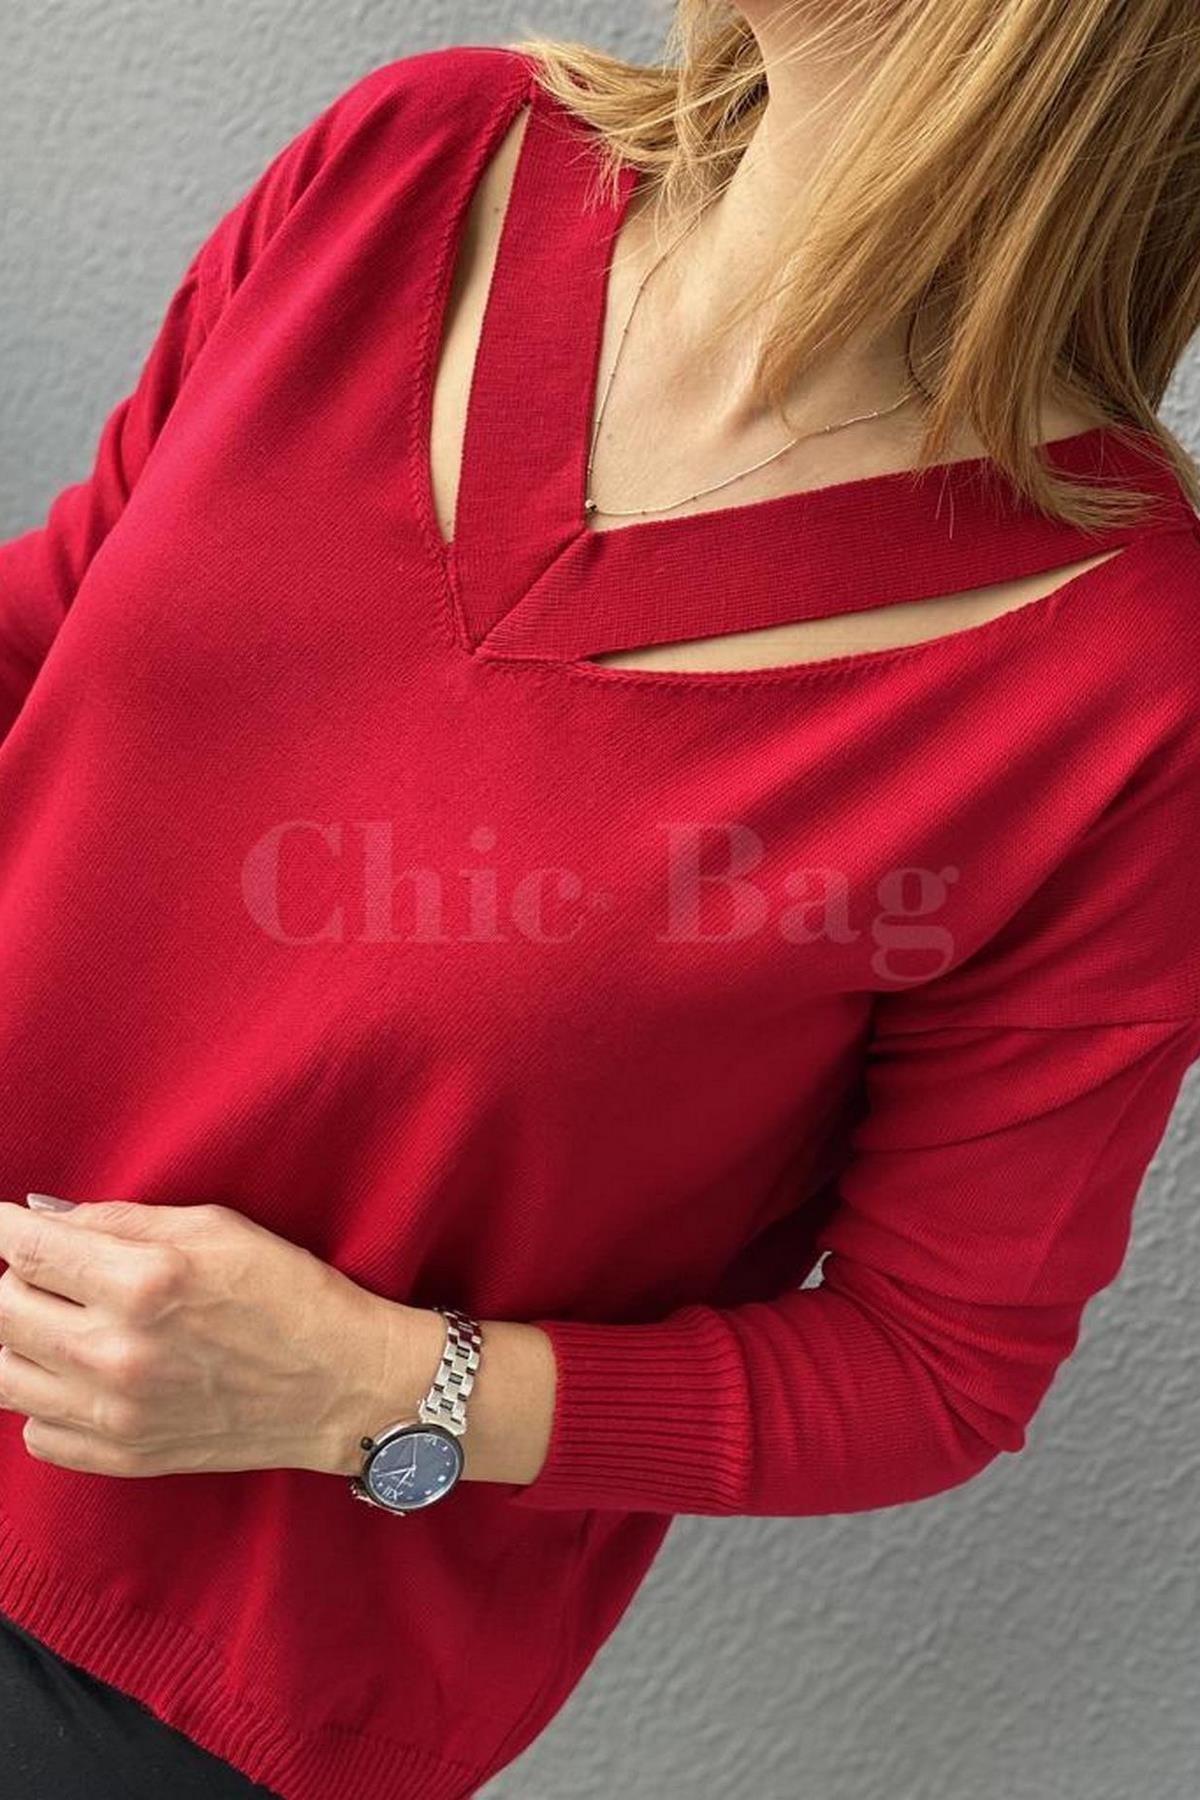 https://resim.chicbag.com.tr/chb11270110/krz/fashion-v-yaka-yaka-kenari-yirtmacli-triko-chb-0001154be-01ab104f8a8c.